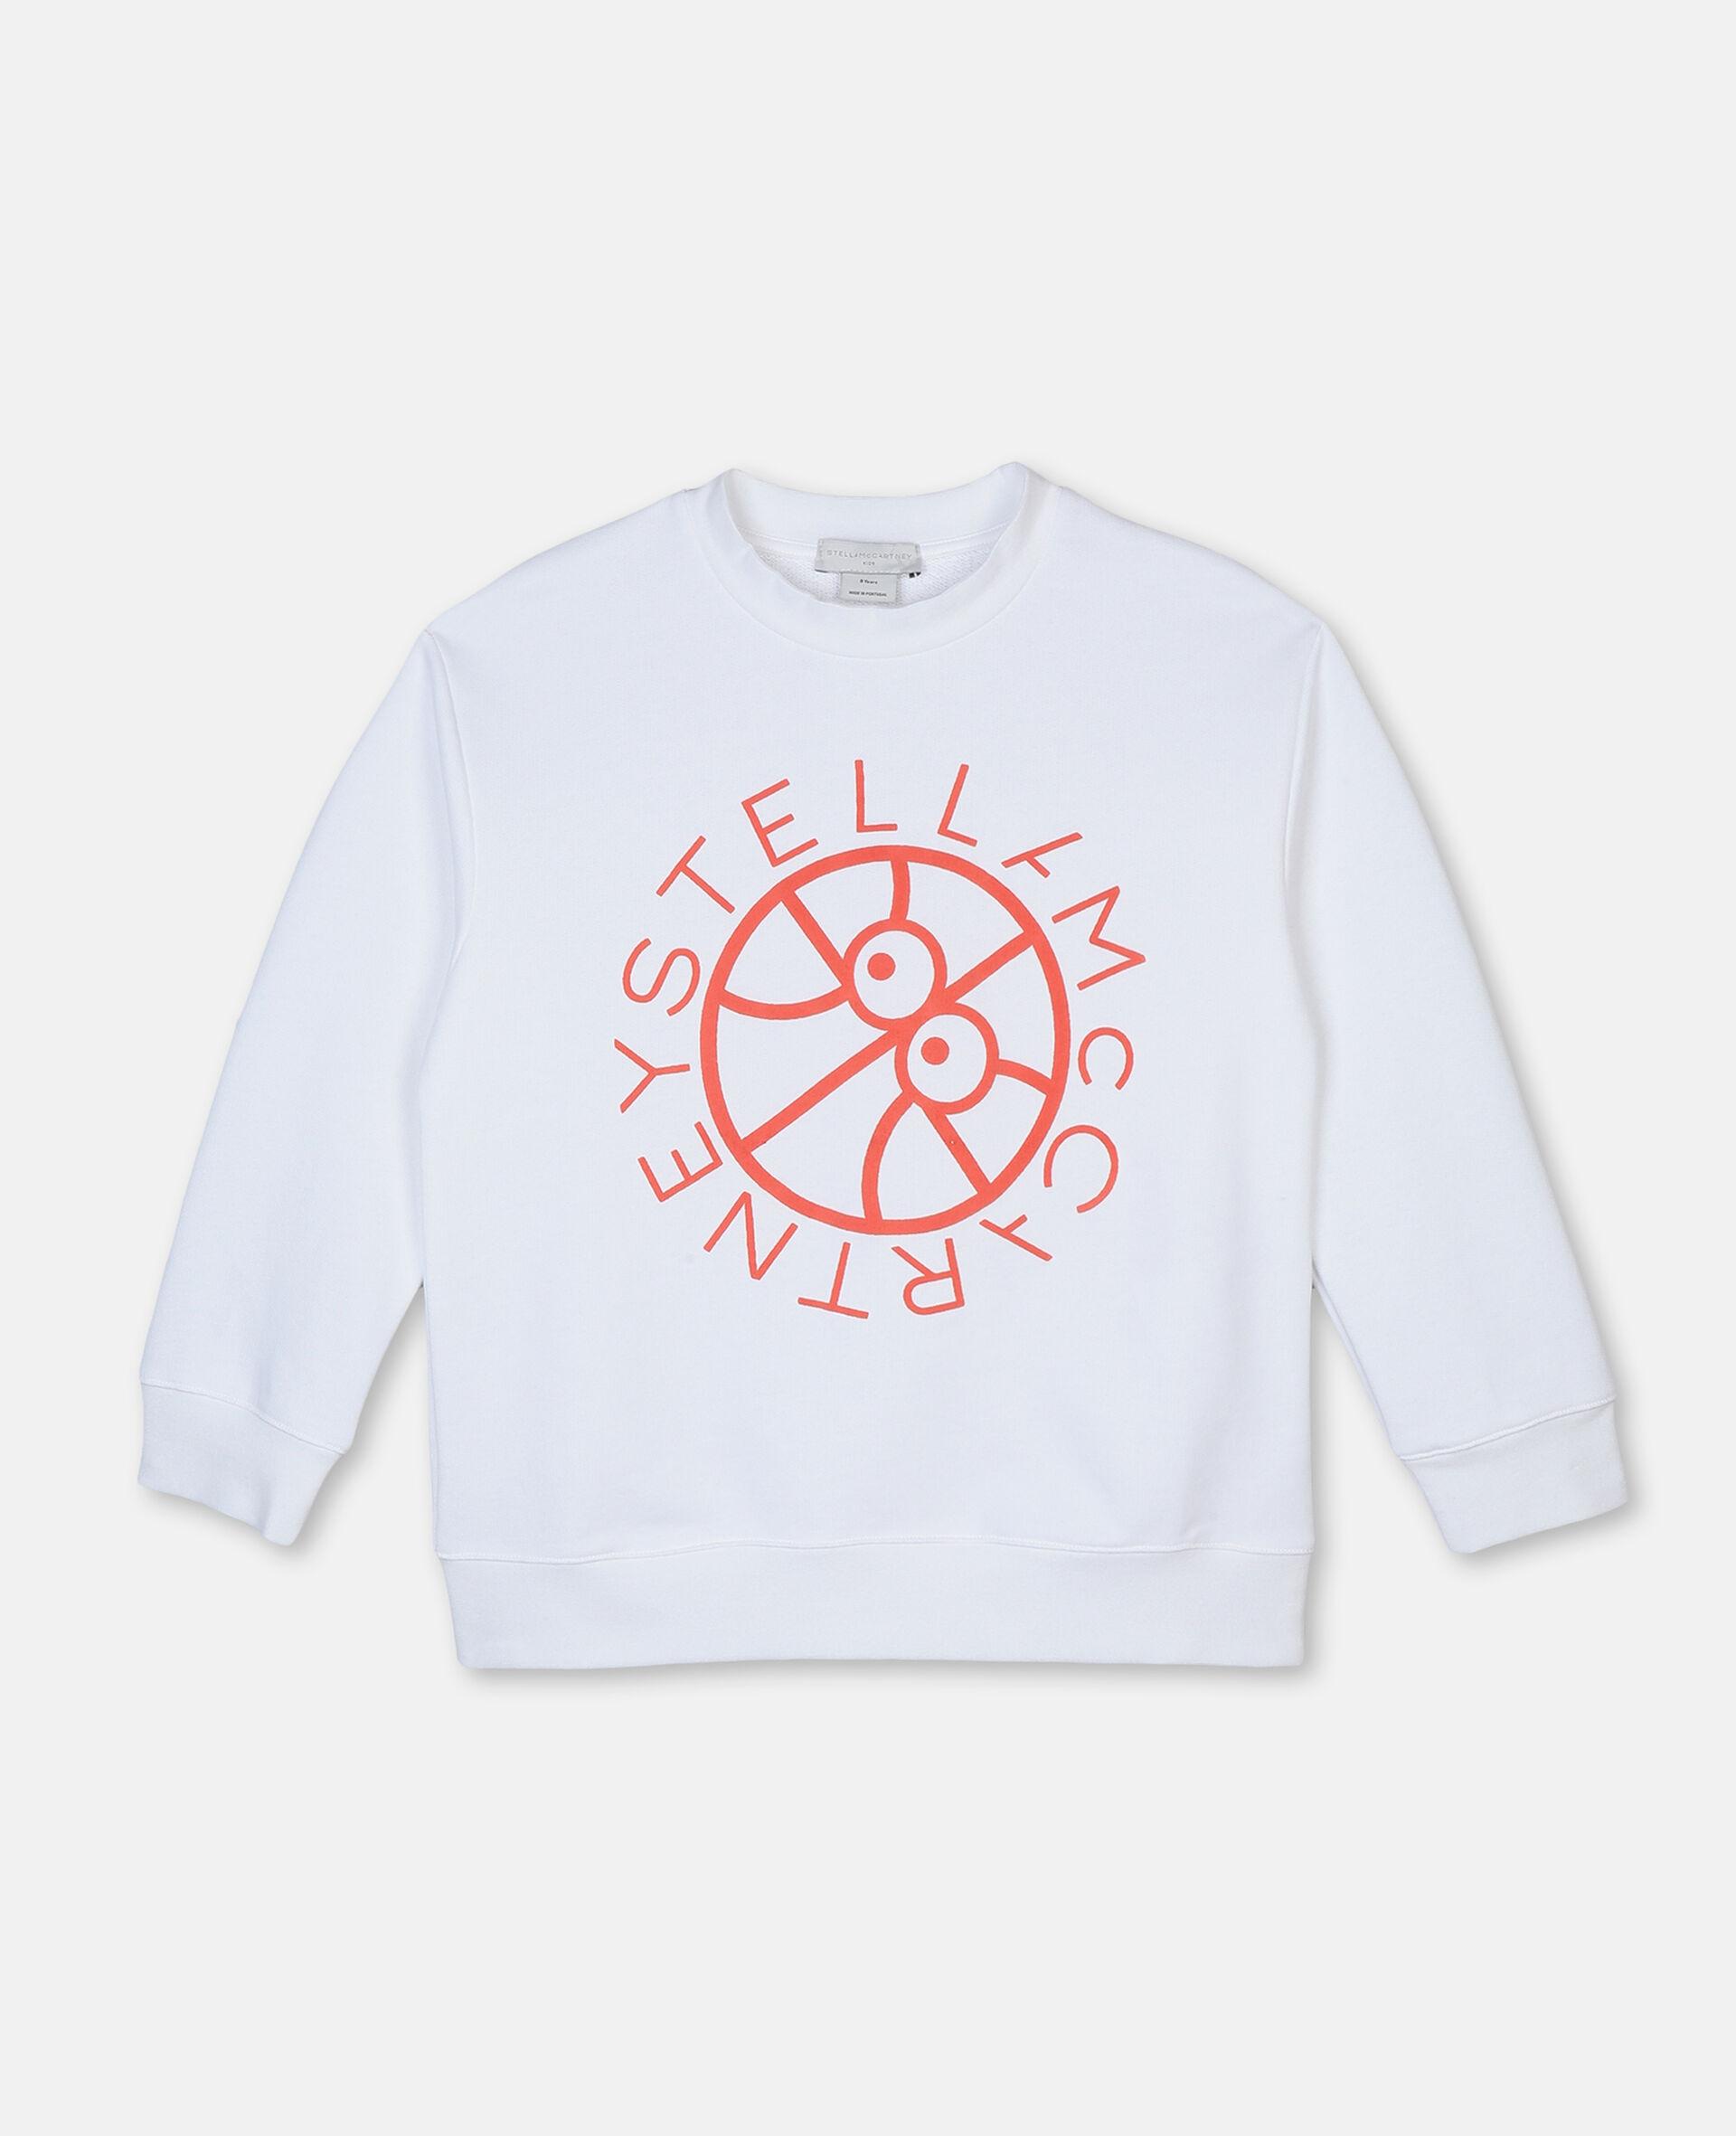 Oversized-Sweatshirt aus Baumwolle mit Basketball-Print -Weiß-large image number 0